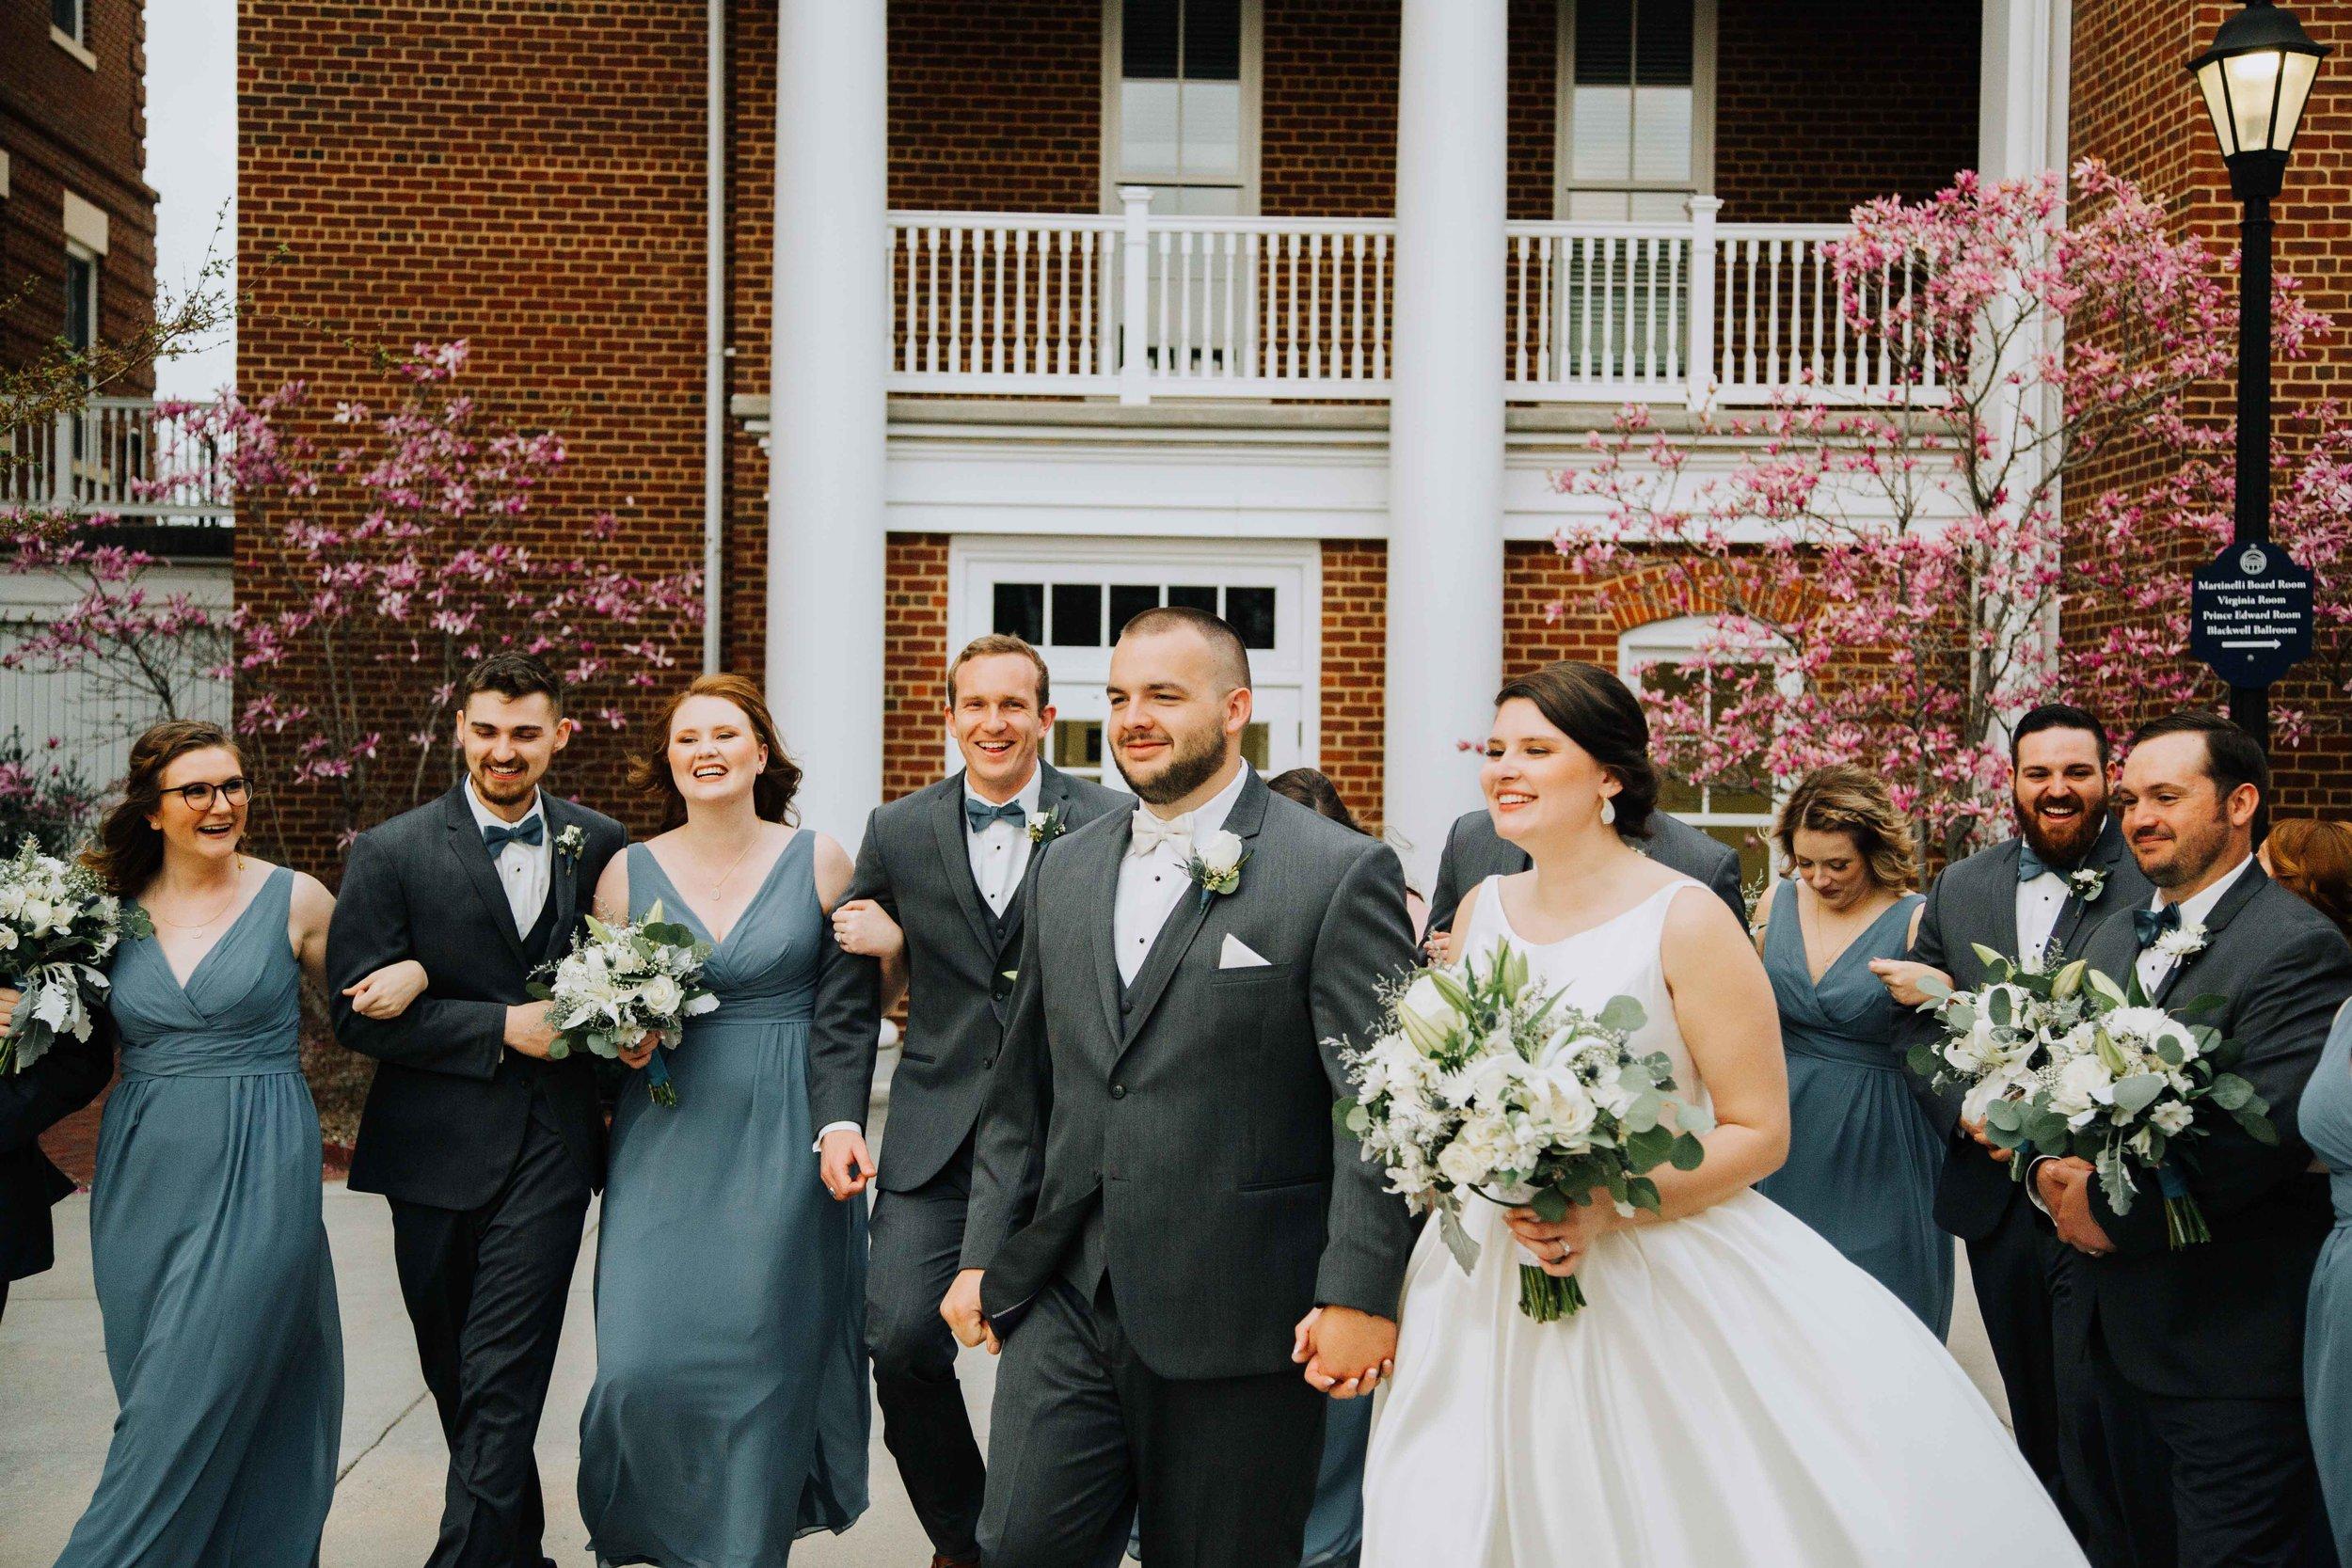 Farmville-Virginia-Wedding-Hotel-Weynoke-Downtown-Jacqueline-Waters-Photography-Detailed- (1139).jpg